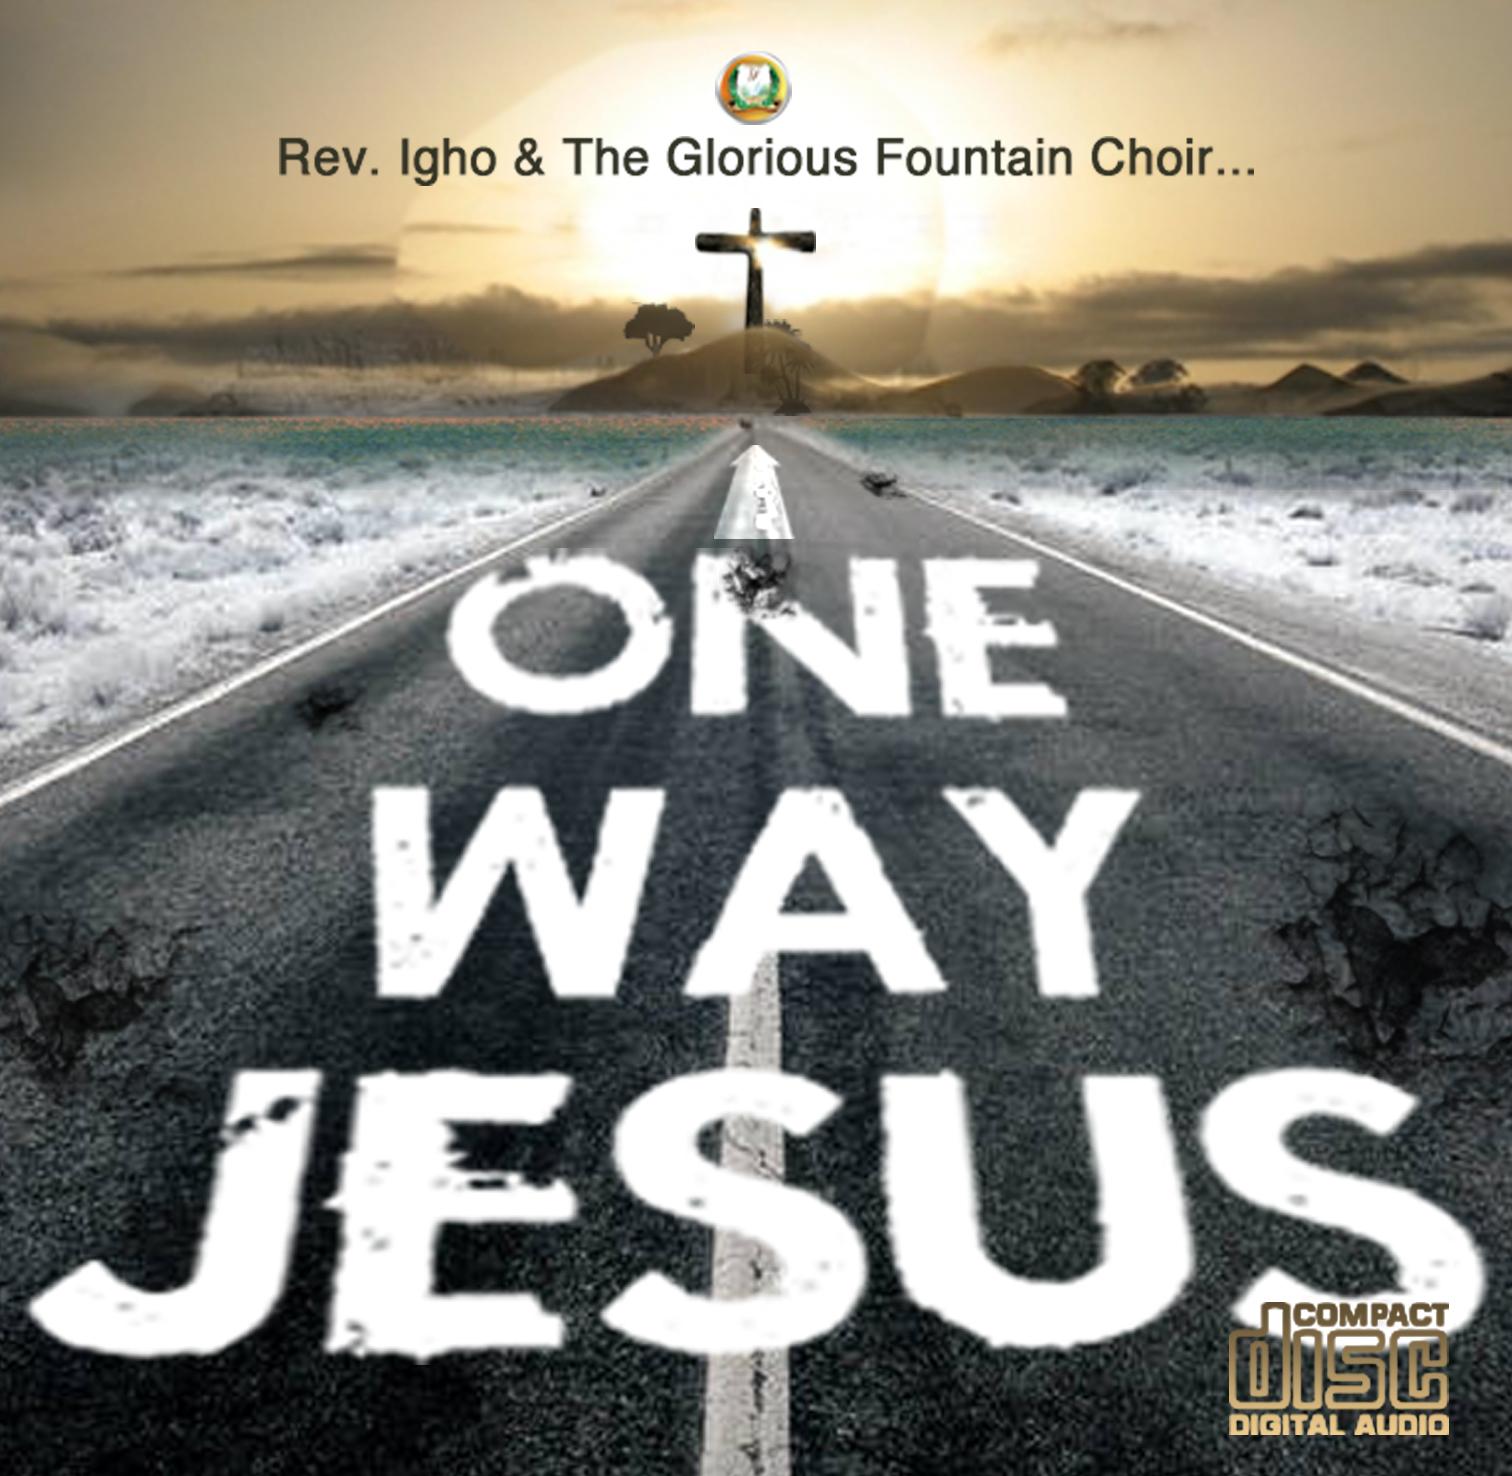 ONE WAY JESUS - Rev Igho & Glorious Fountain Choir [@teamGFM